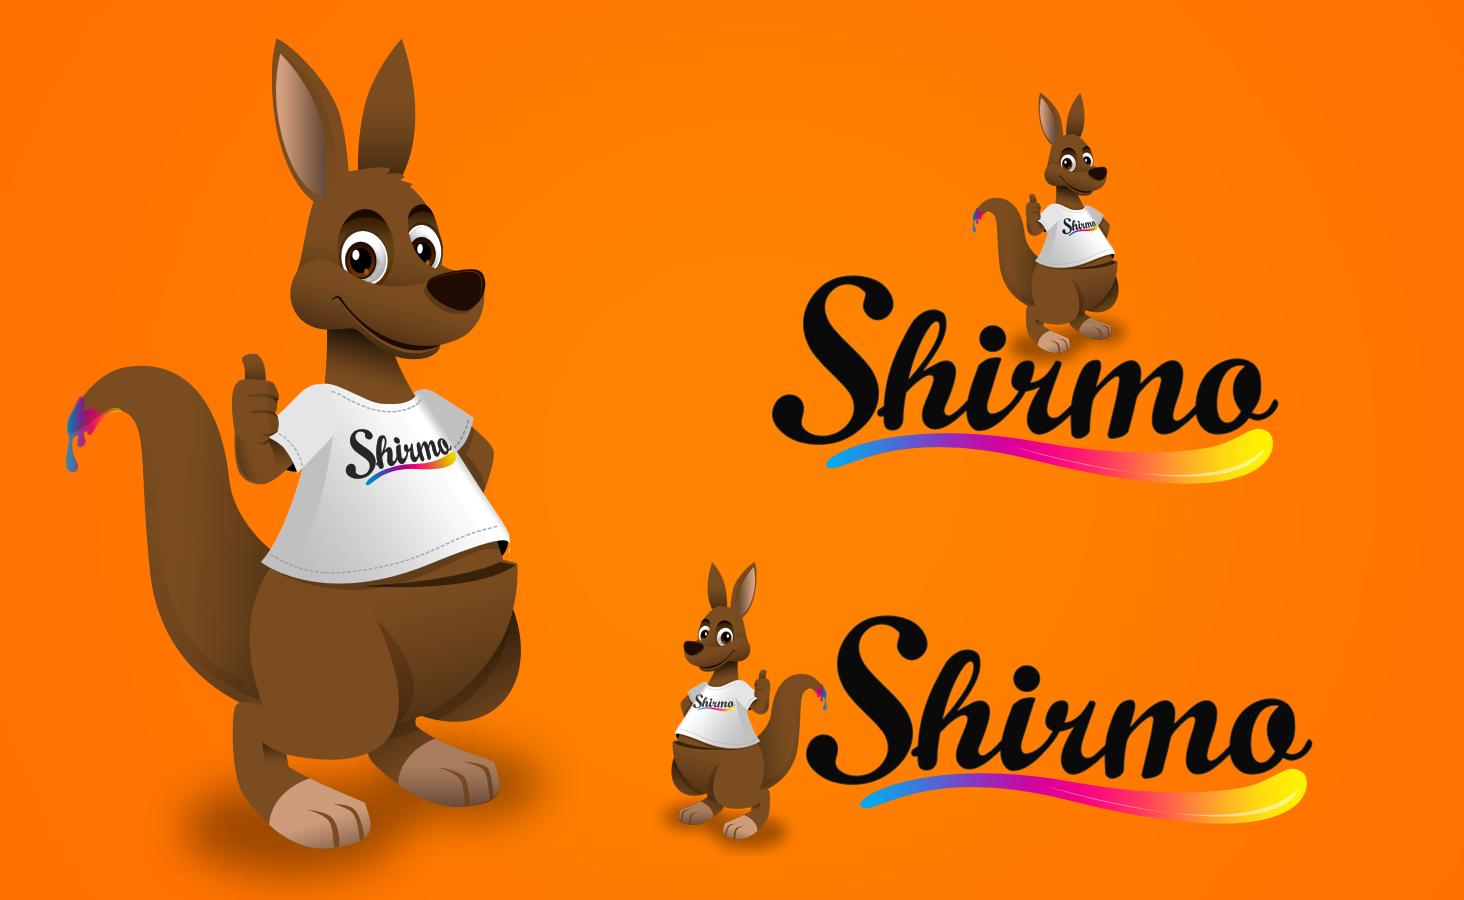 Create the next logo for Shirmo